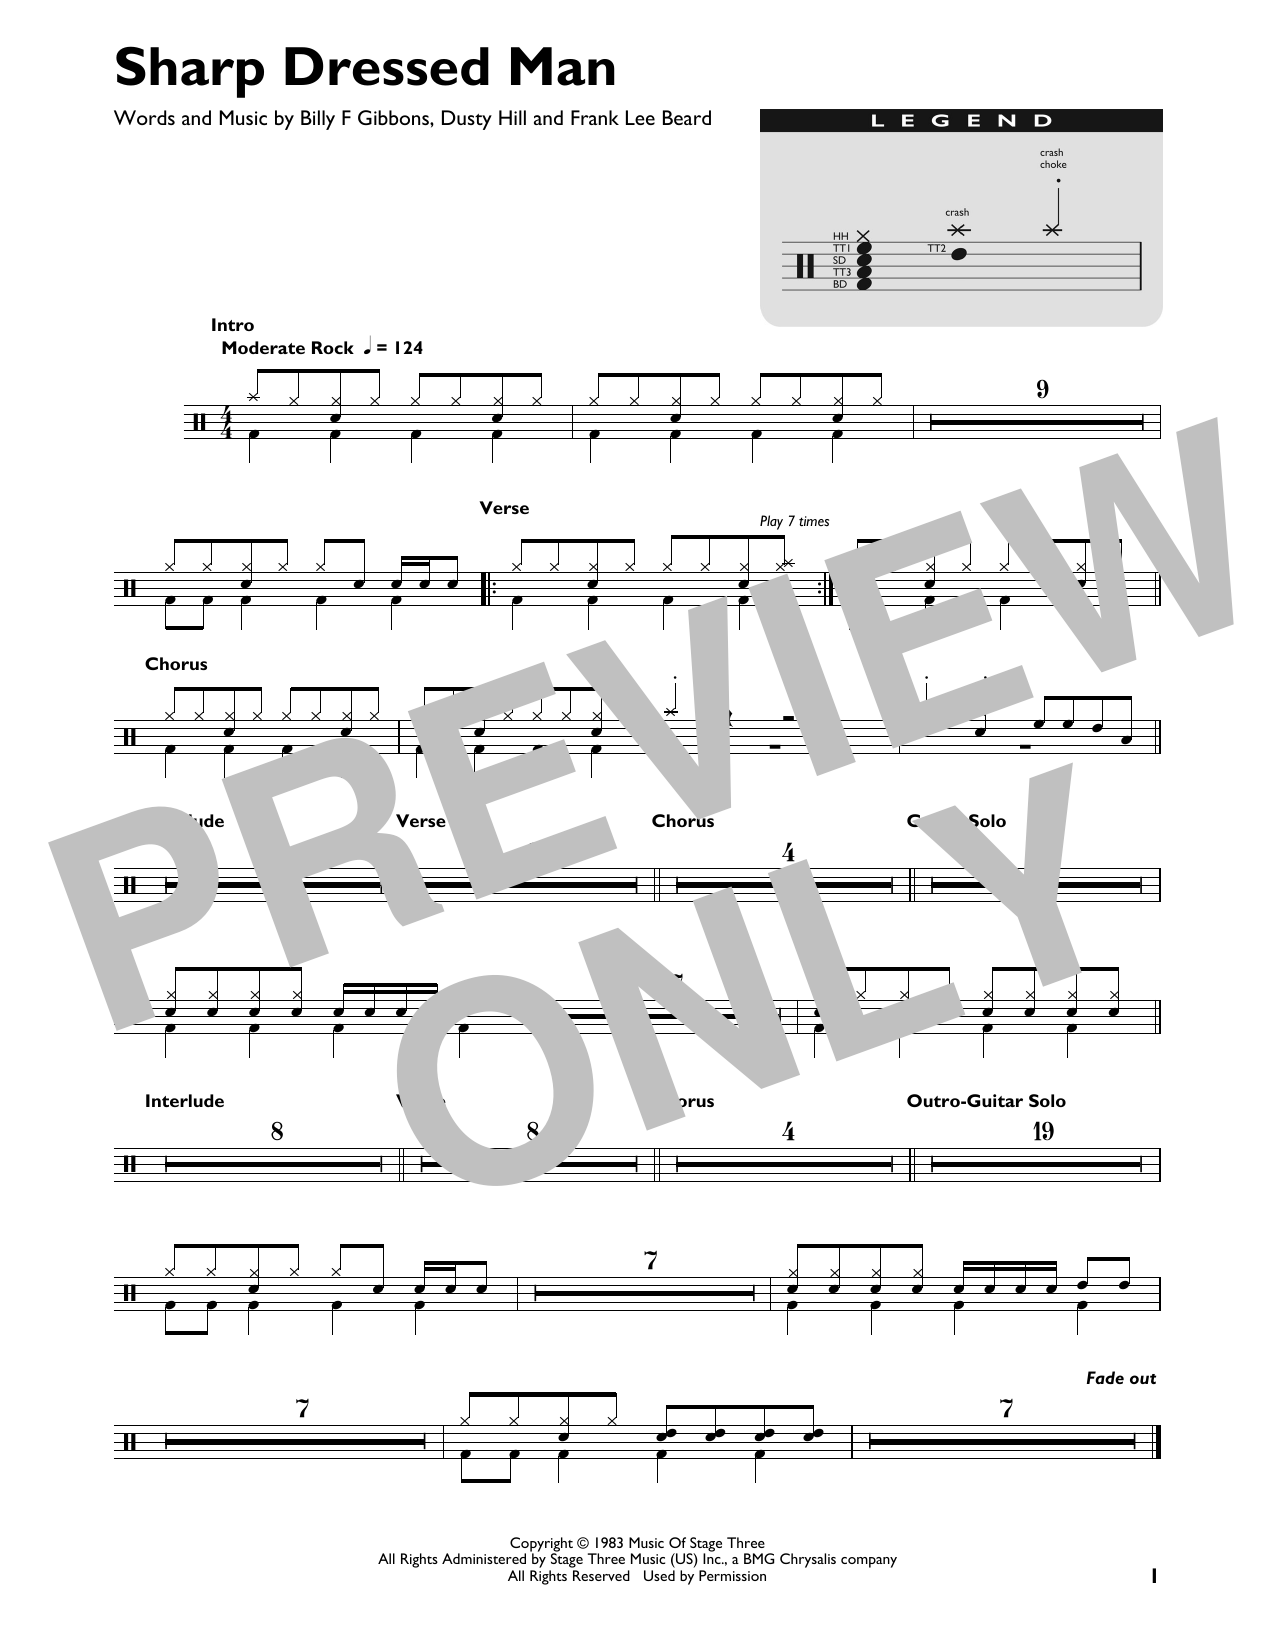 Zz Top Sharp Dressed Man Sheet Music Download Pdf Score 22865